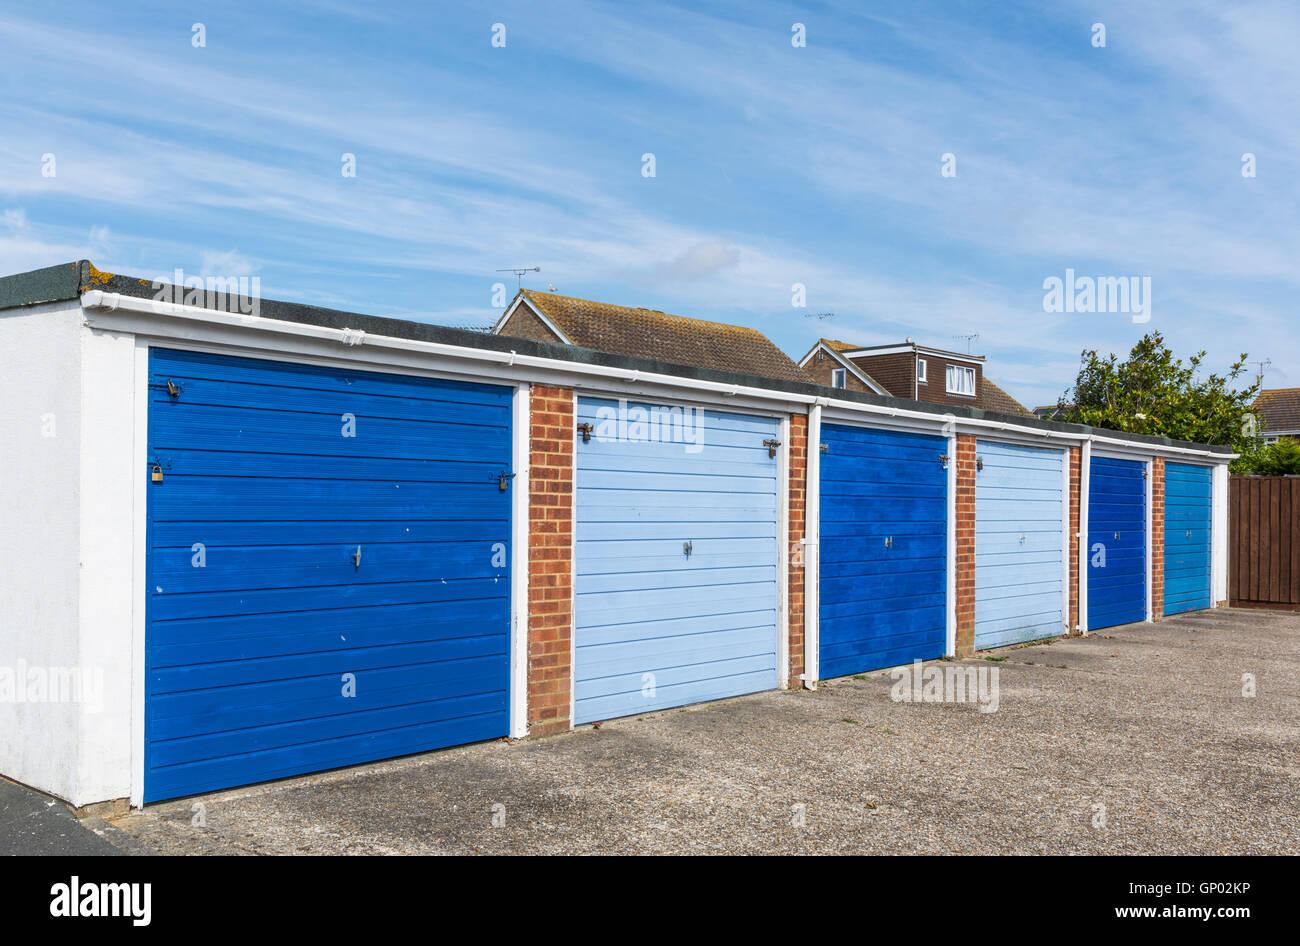 Alquiler de Garajes privados en Inglaterra, Reino Unido. Imagen De Stock